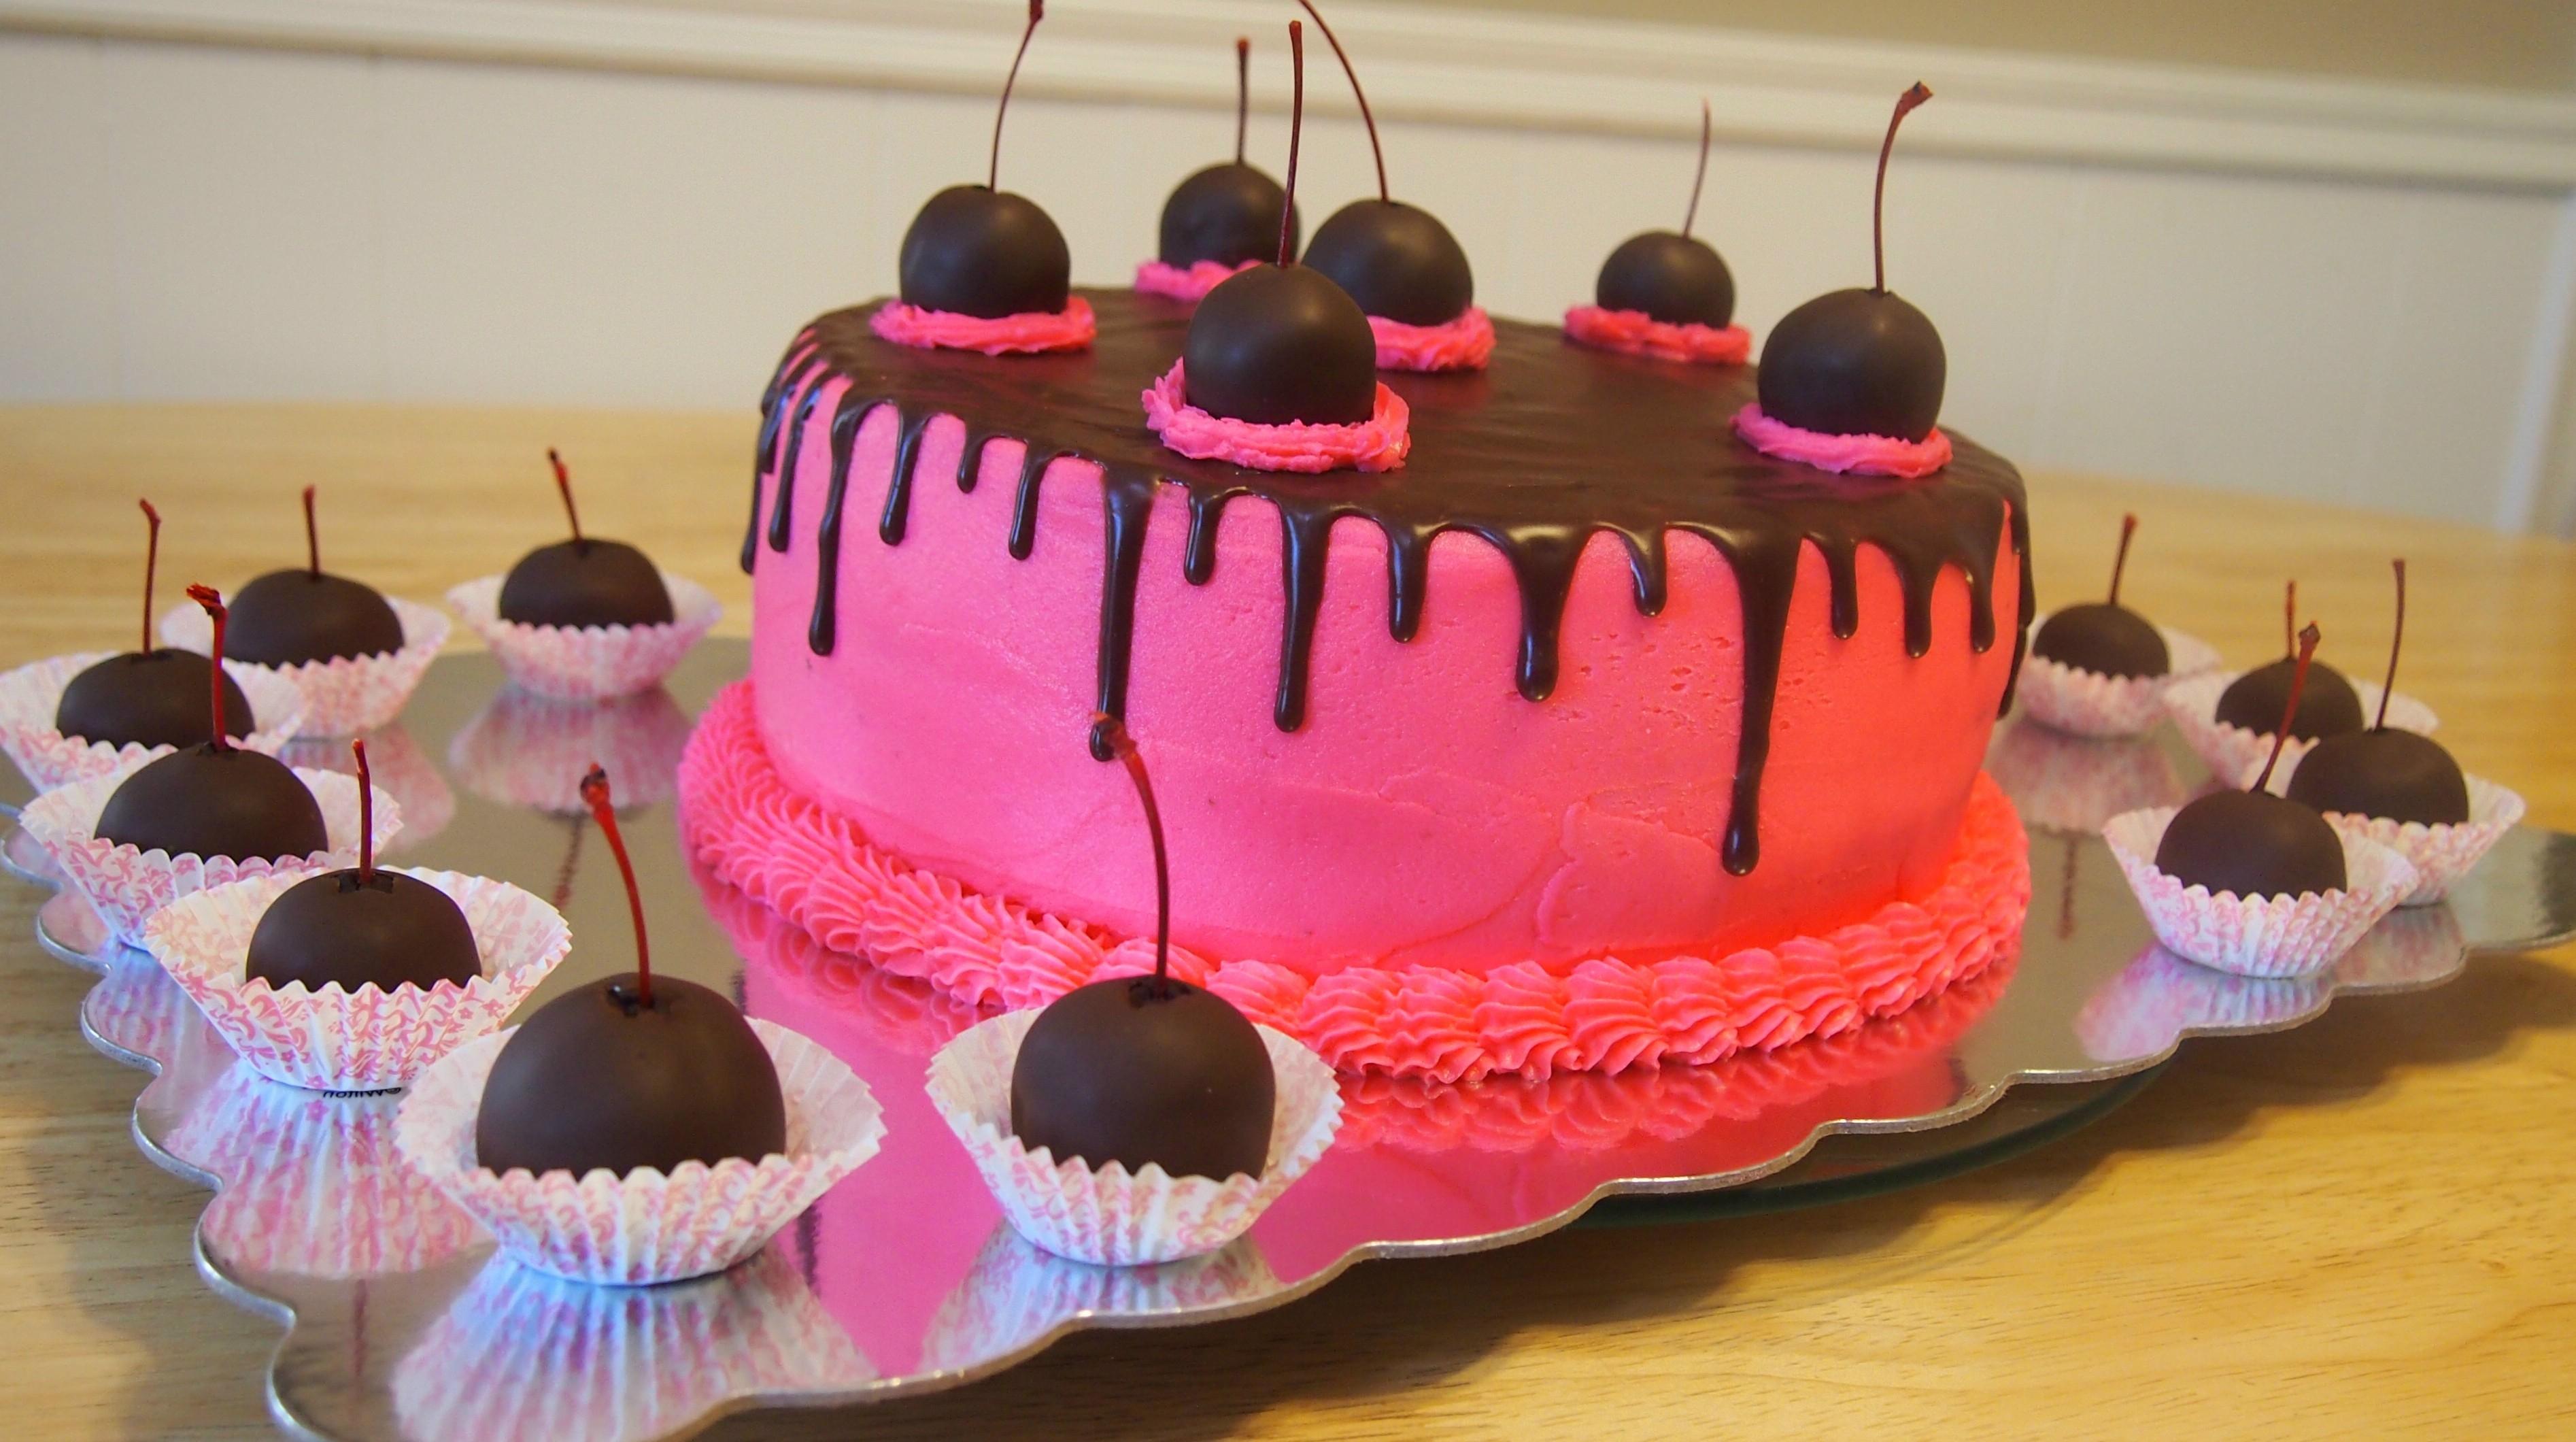 Cherries Cake Decorating Photos